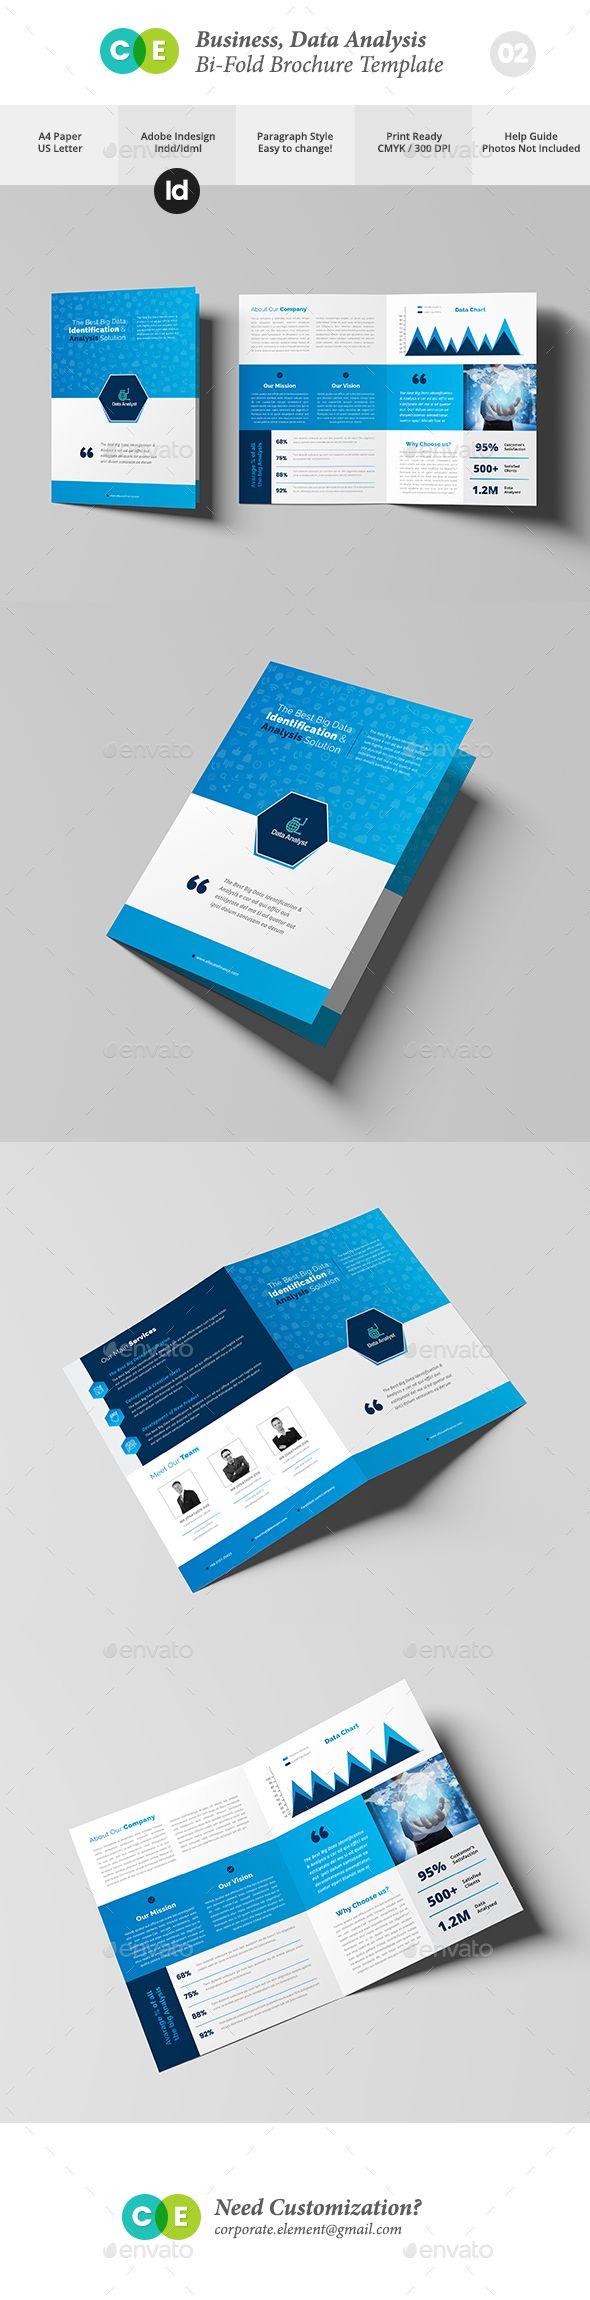 Business Data Analysis BiFold Brochure V  Brochures Brochure